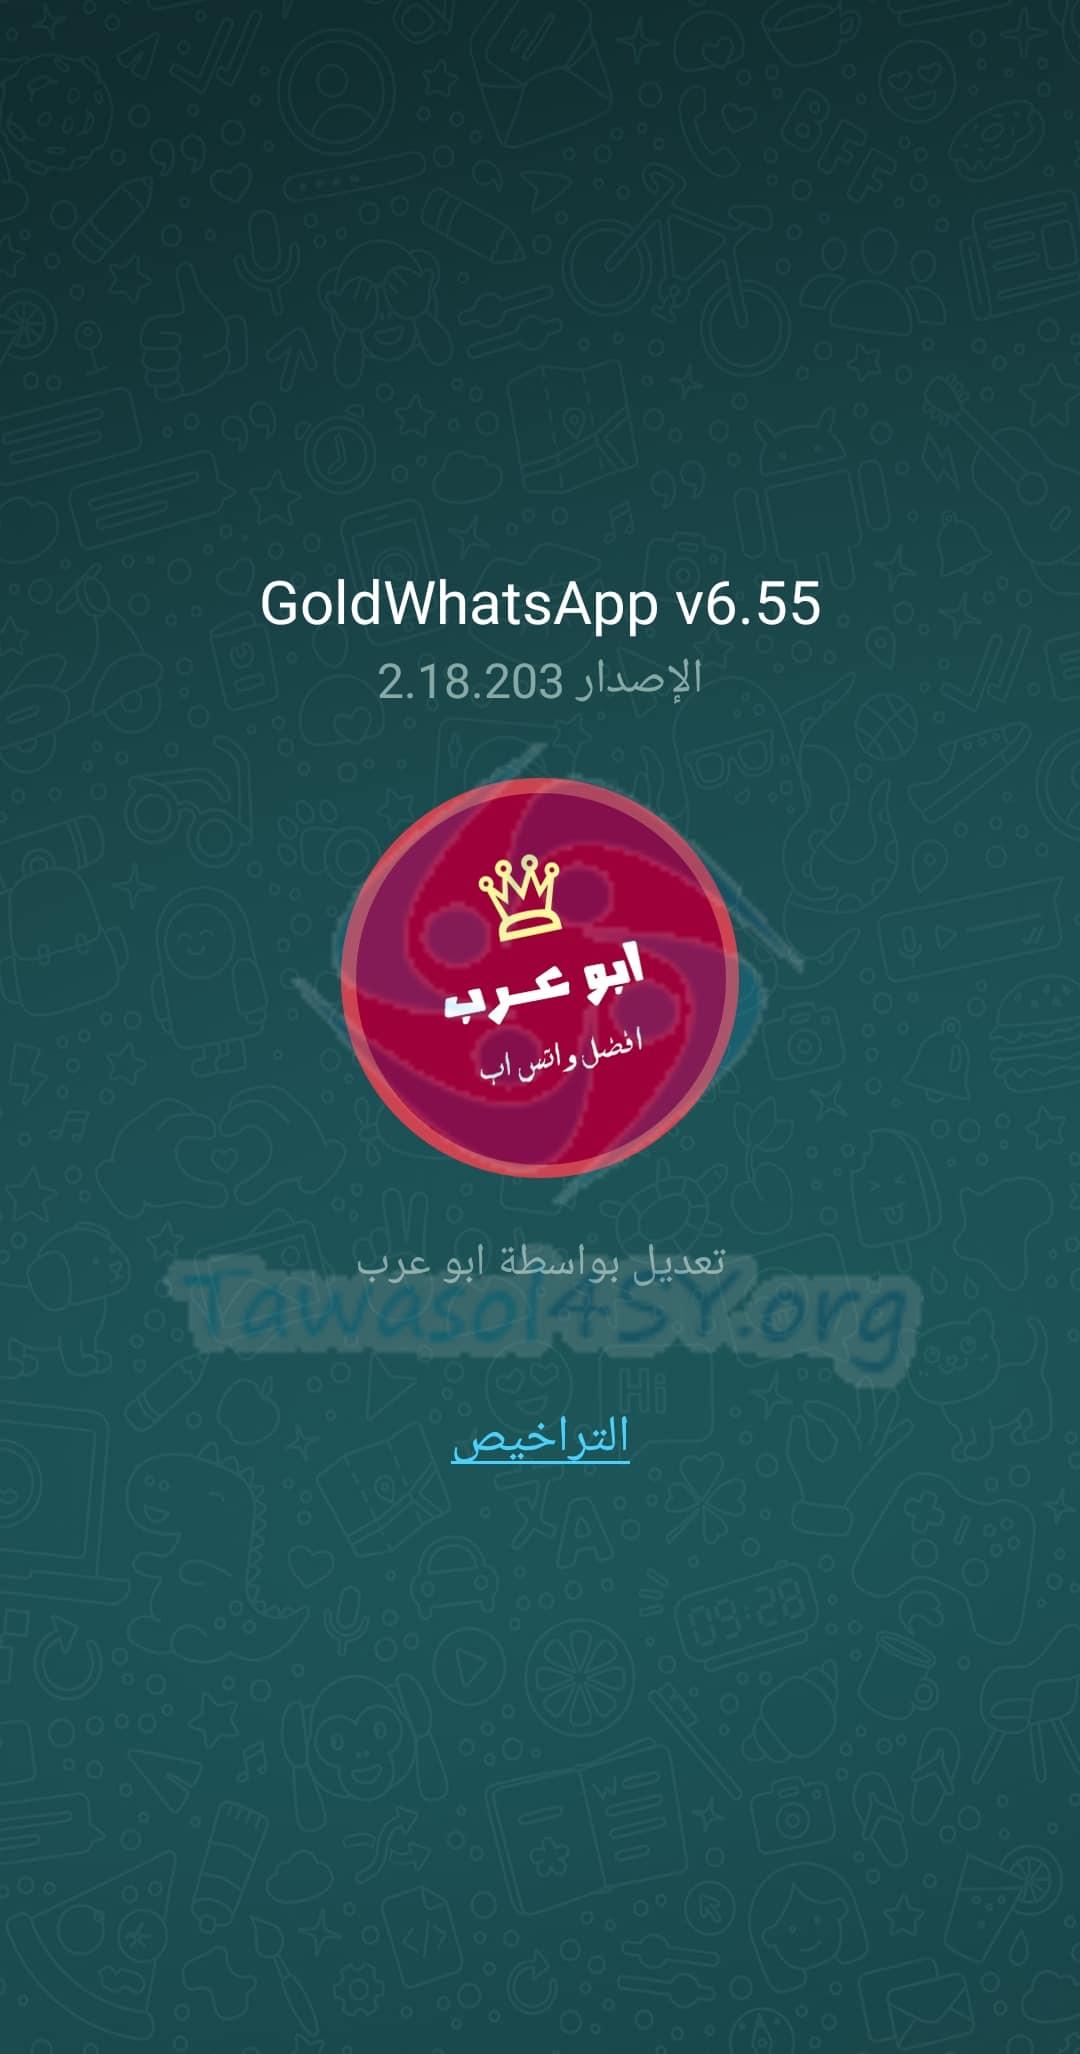 تحميل whatsapp gold